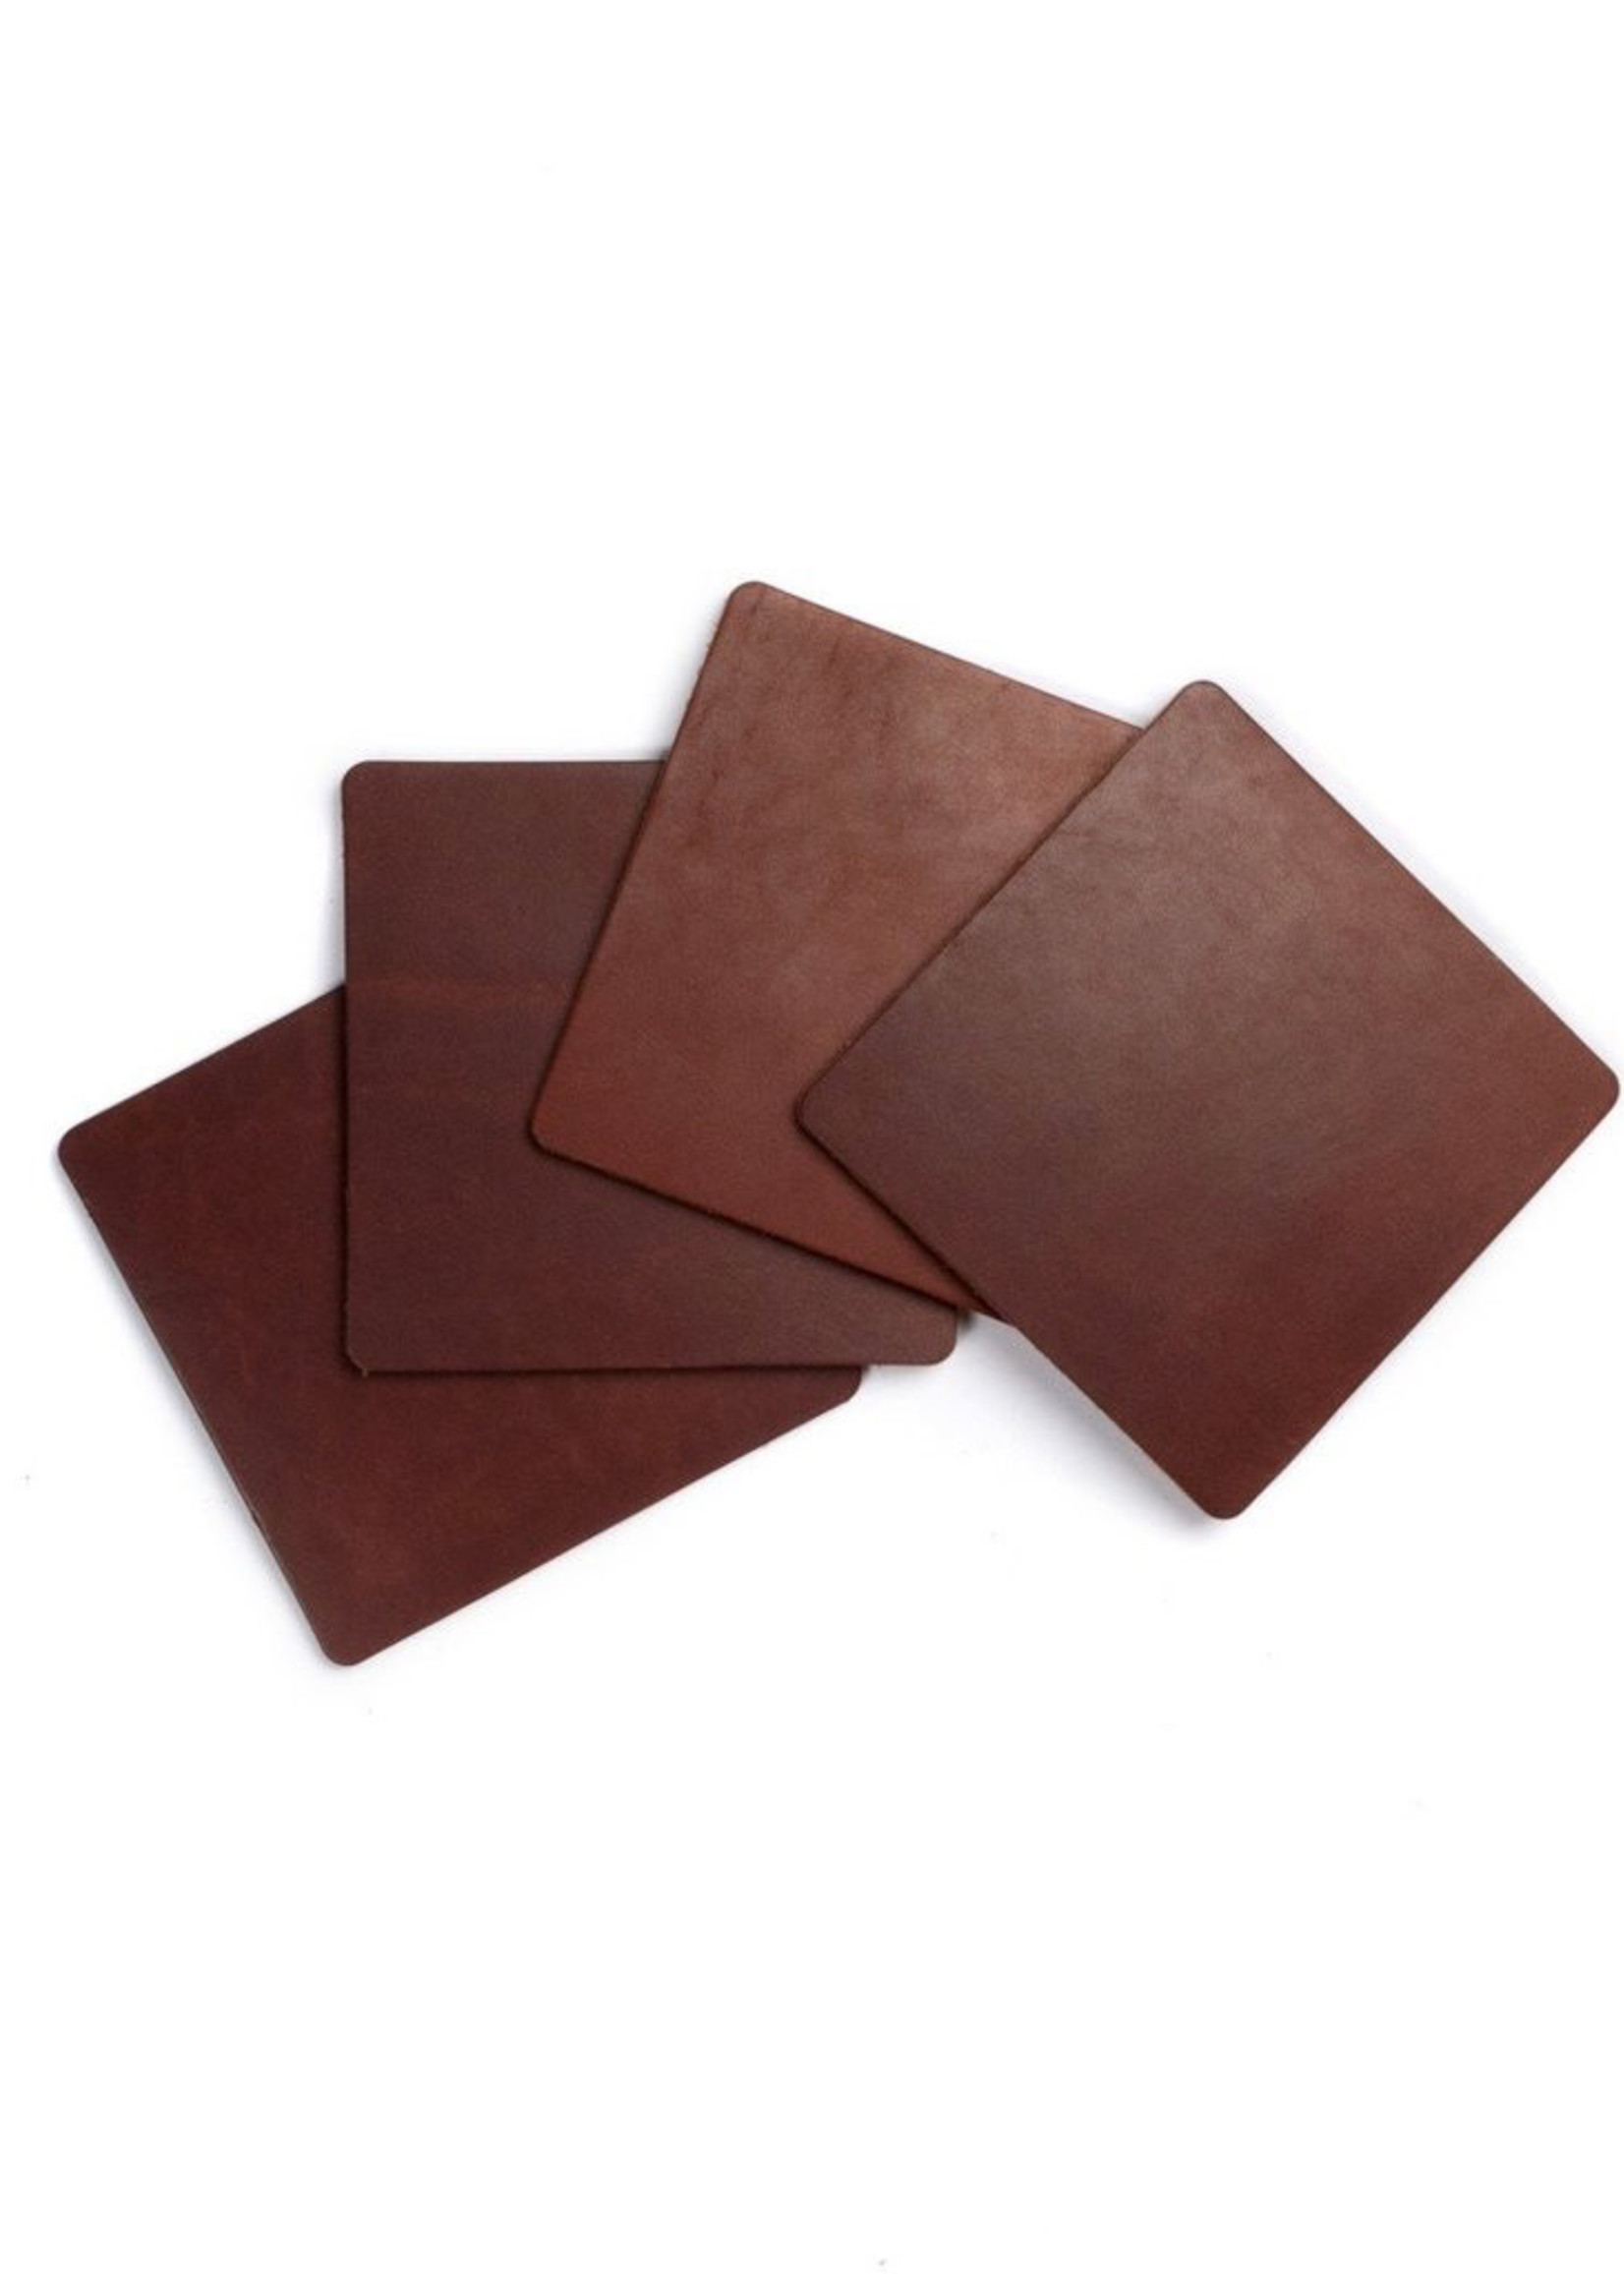 Ultra Leather Coaster Set- Dark Brown